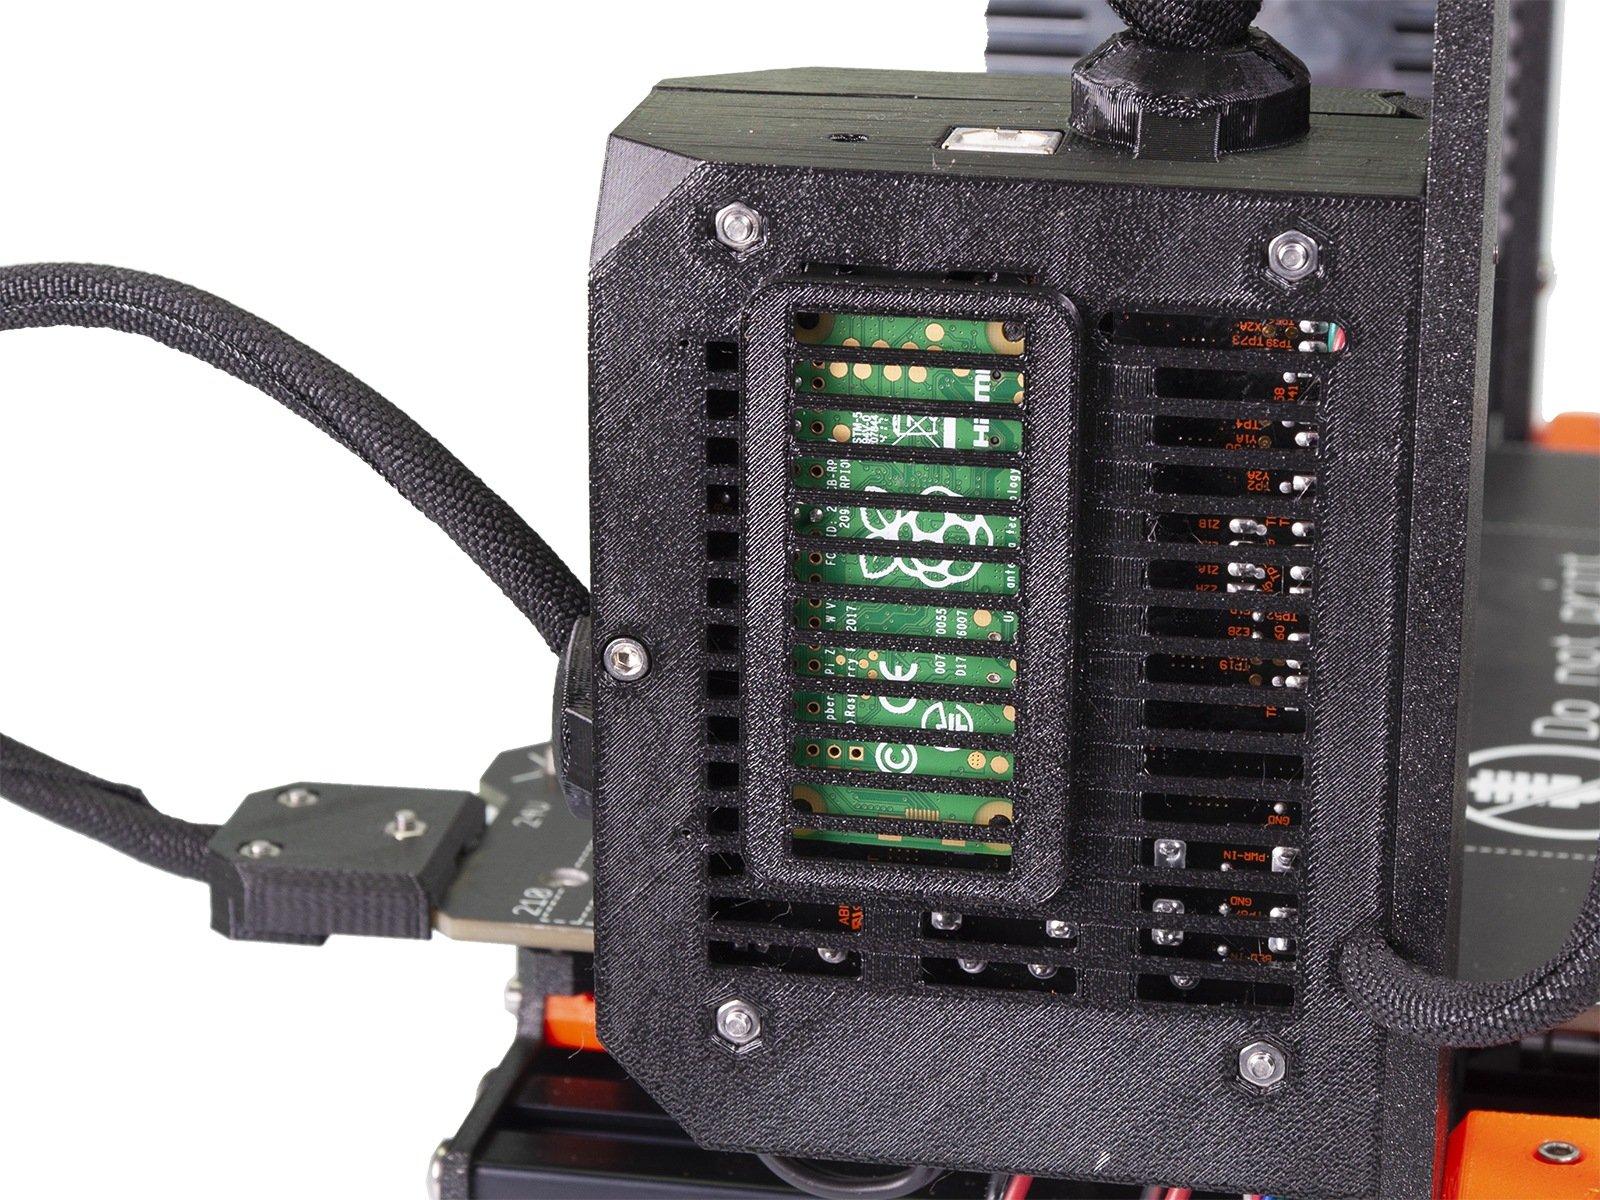 MK3S to Raspberry Pi cable Custom made for you! Prusa i3 MK3